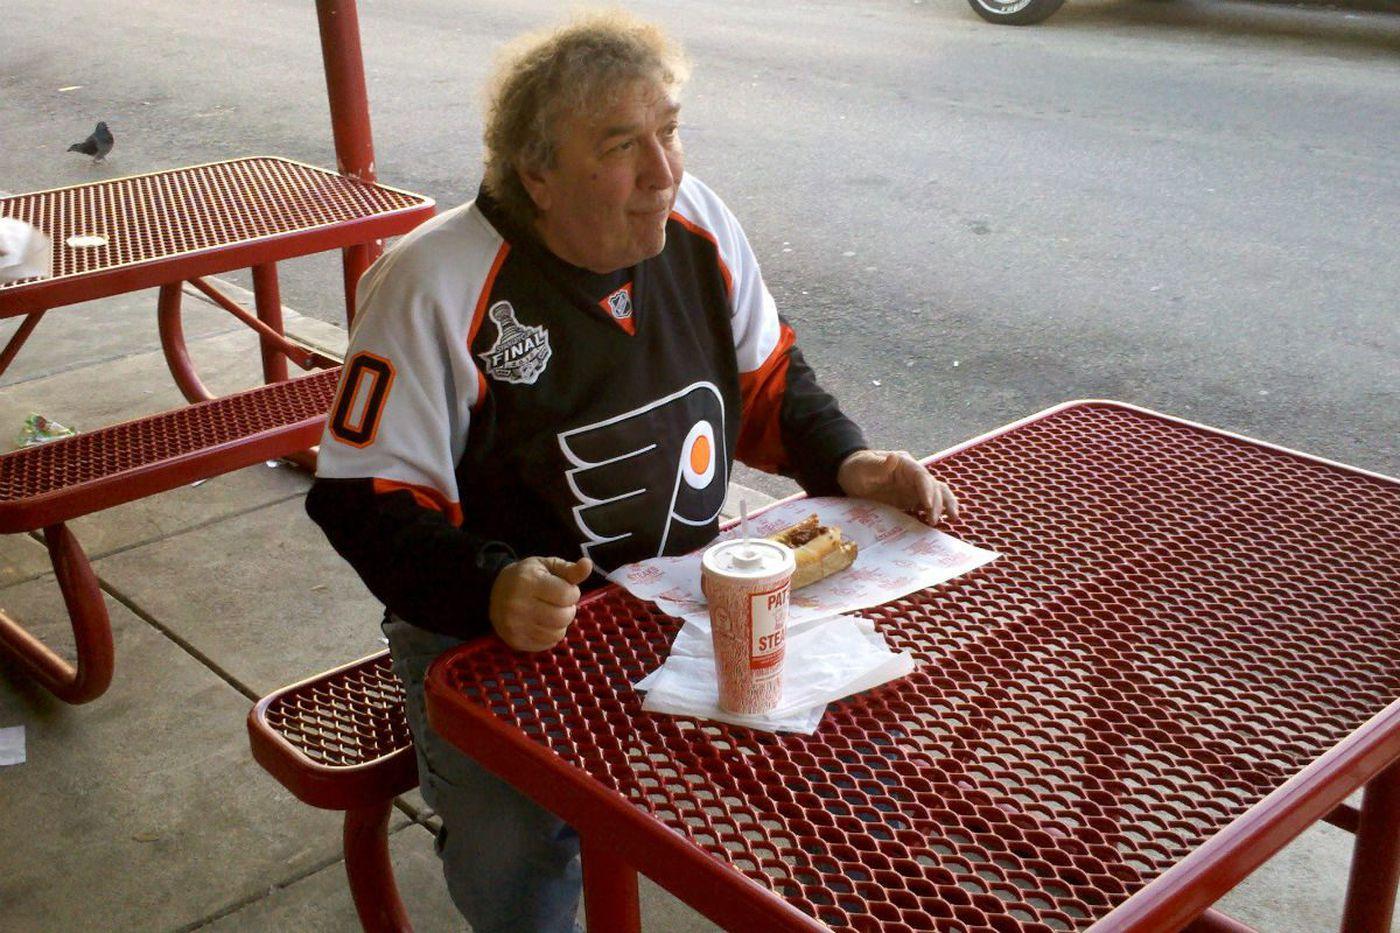 Grandpa's final wish granted: Bury me wit Pat's cheesesteaks